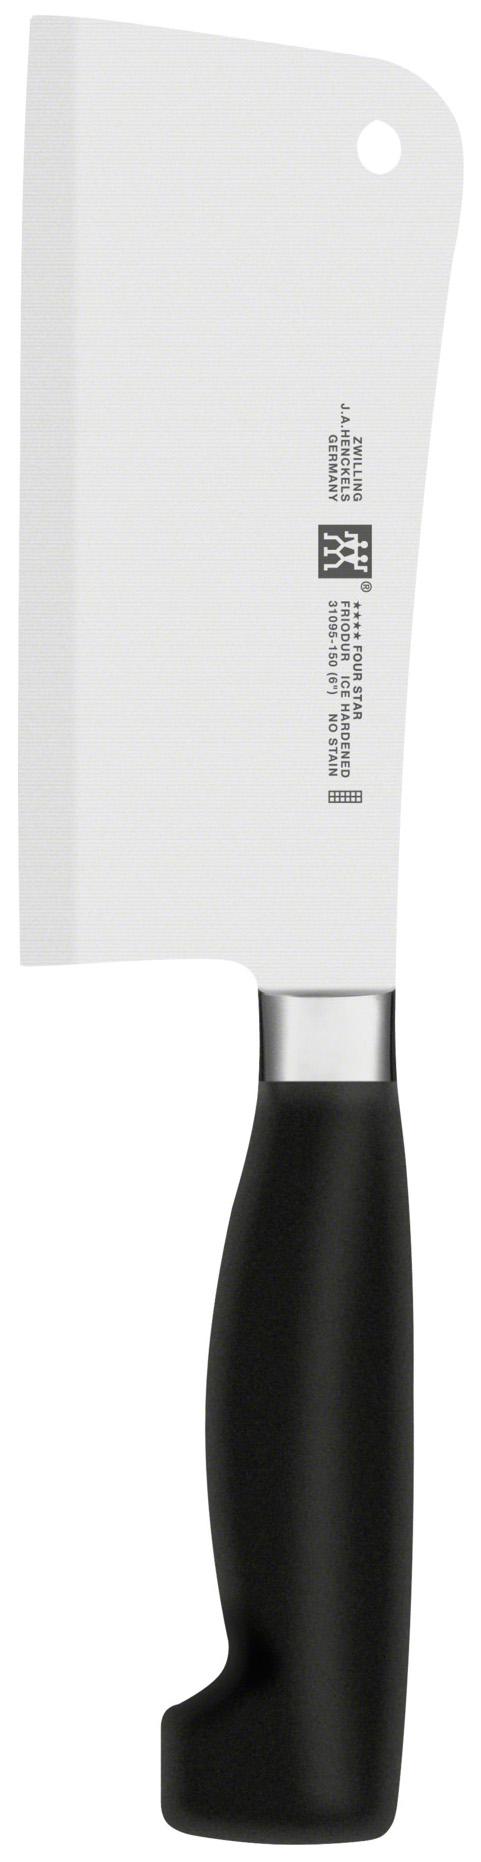 Топорик для мяса Zwilling H31095 151